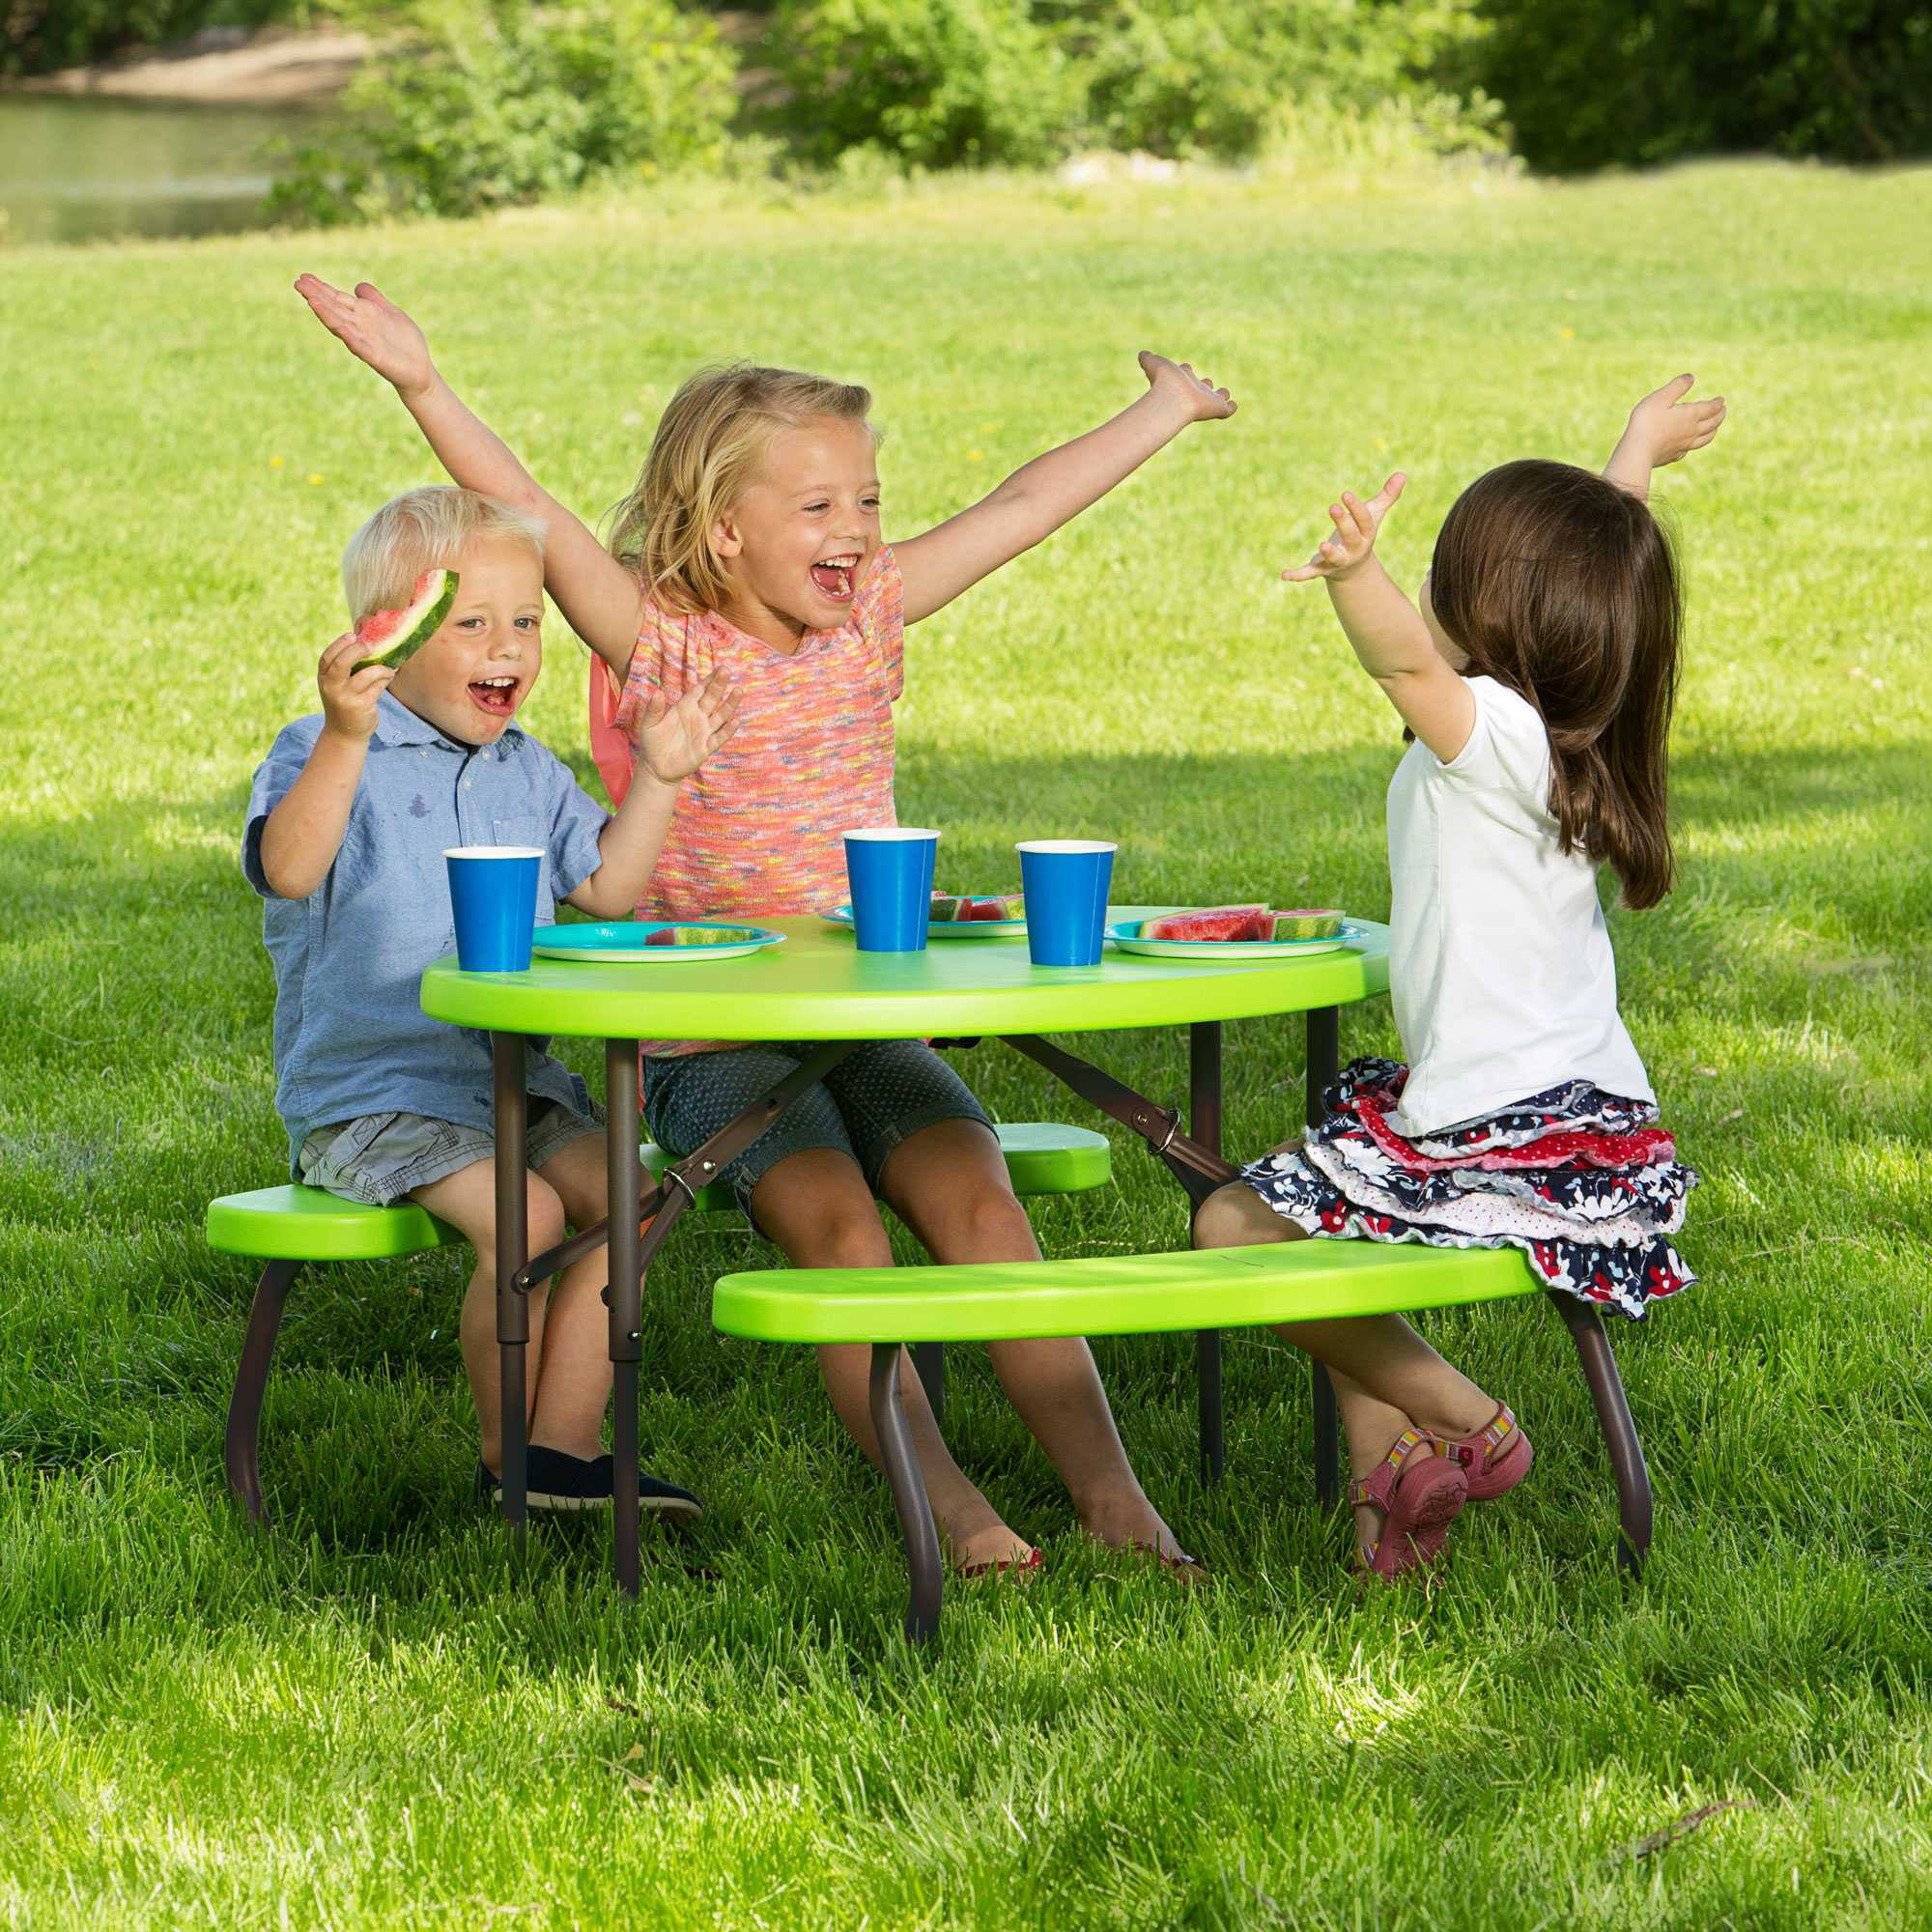 Lifetime Children\u0027s Oval Picnic Table, Lime Green - Walmart.com